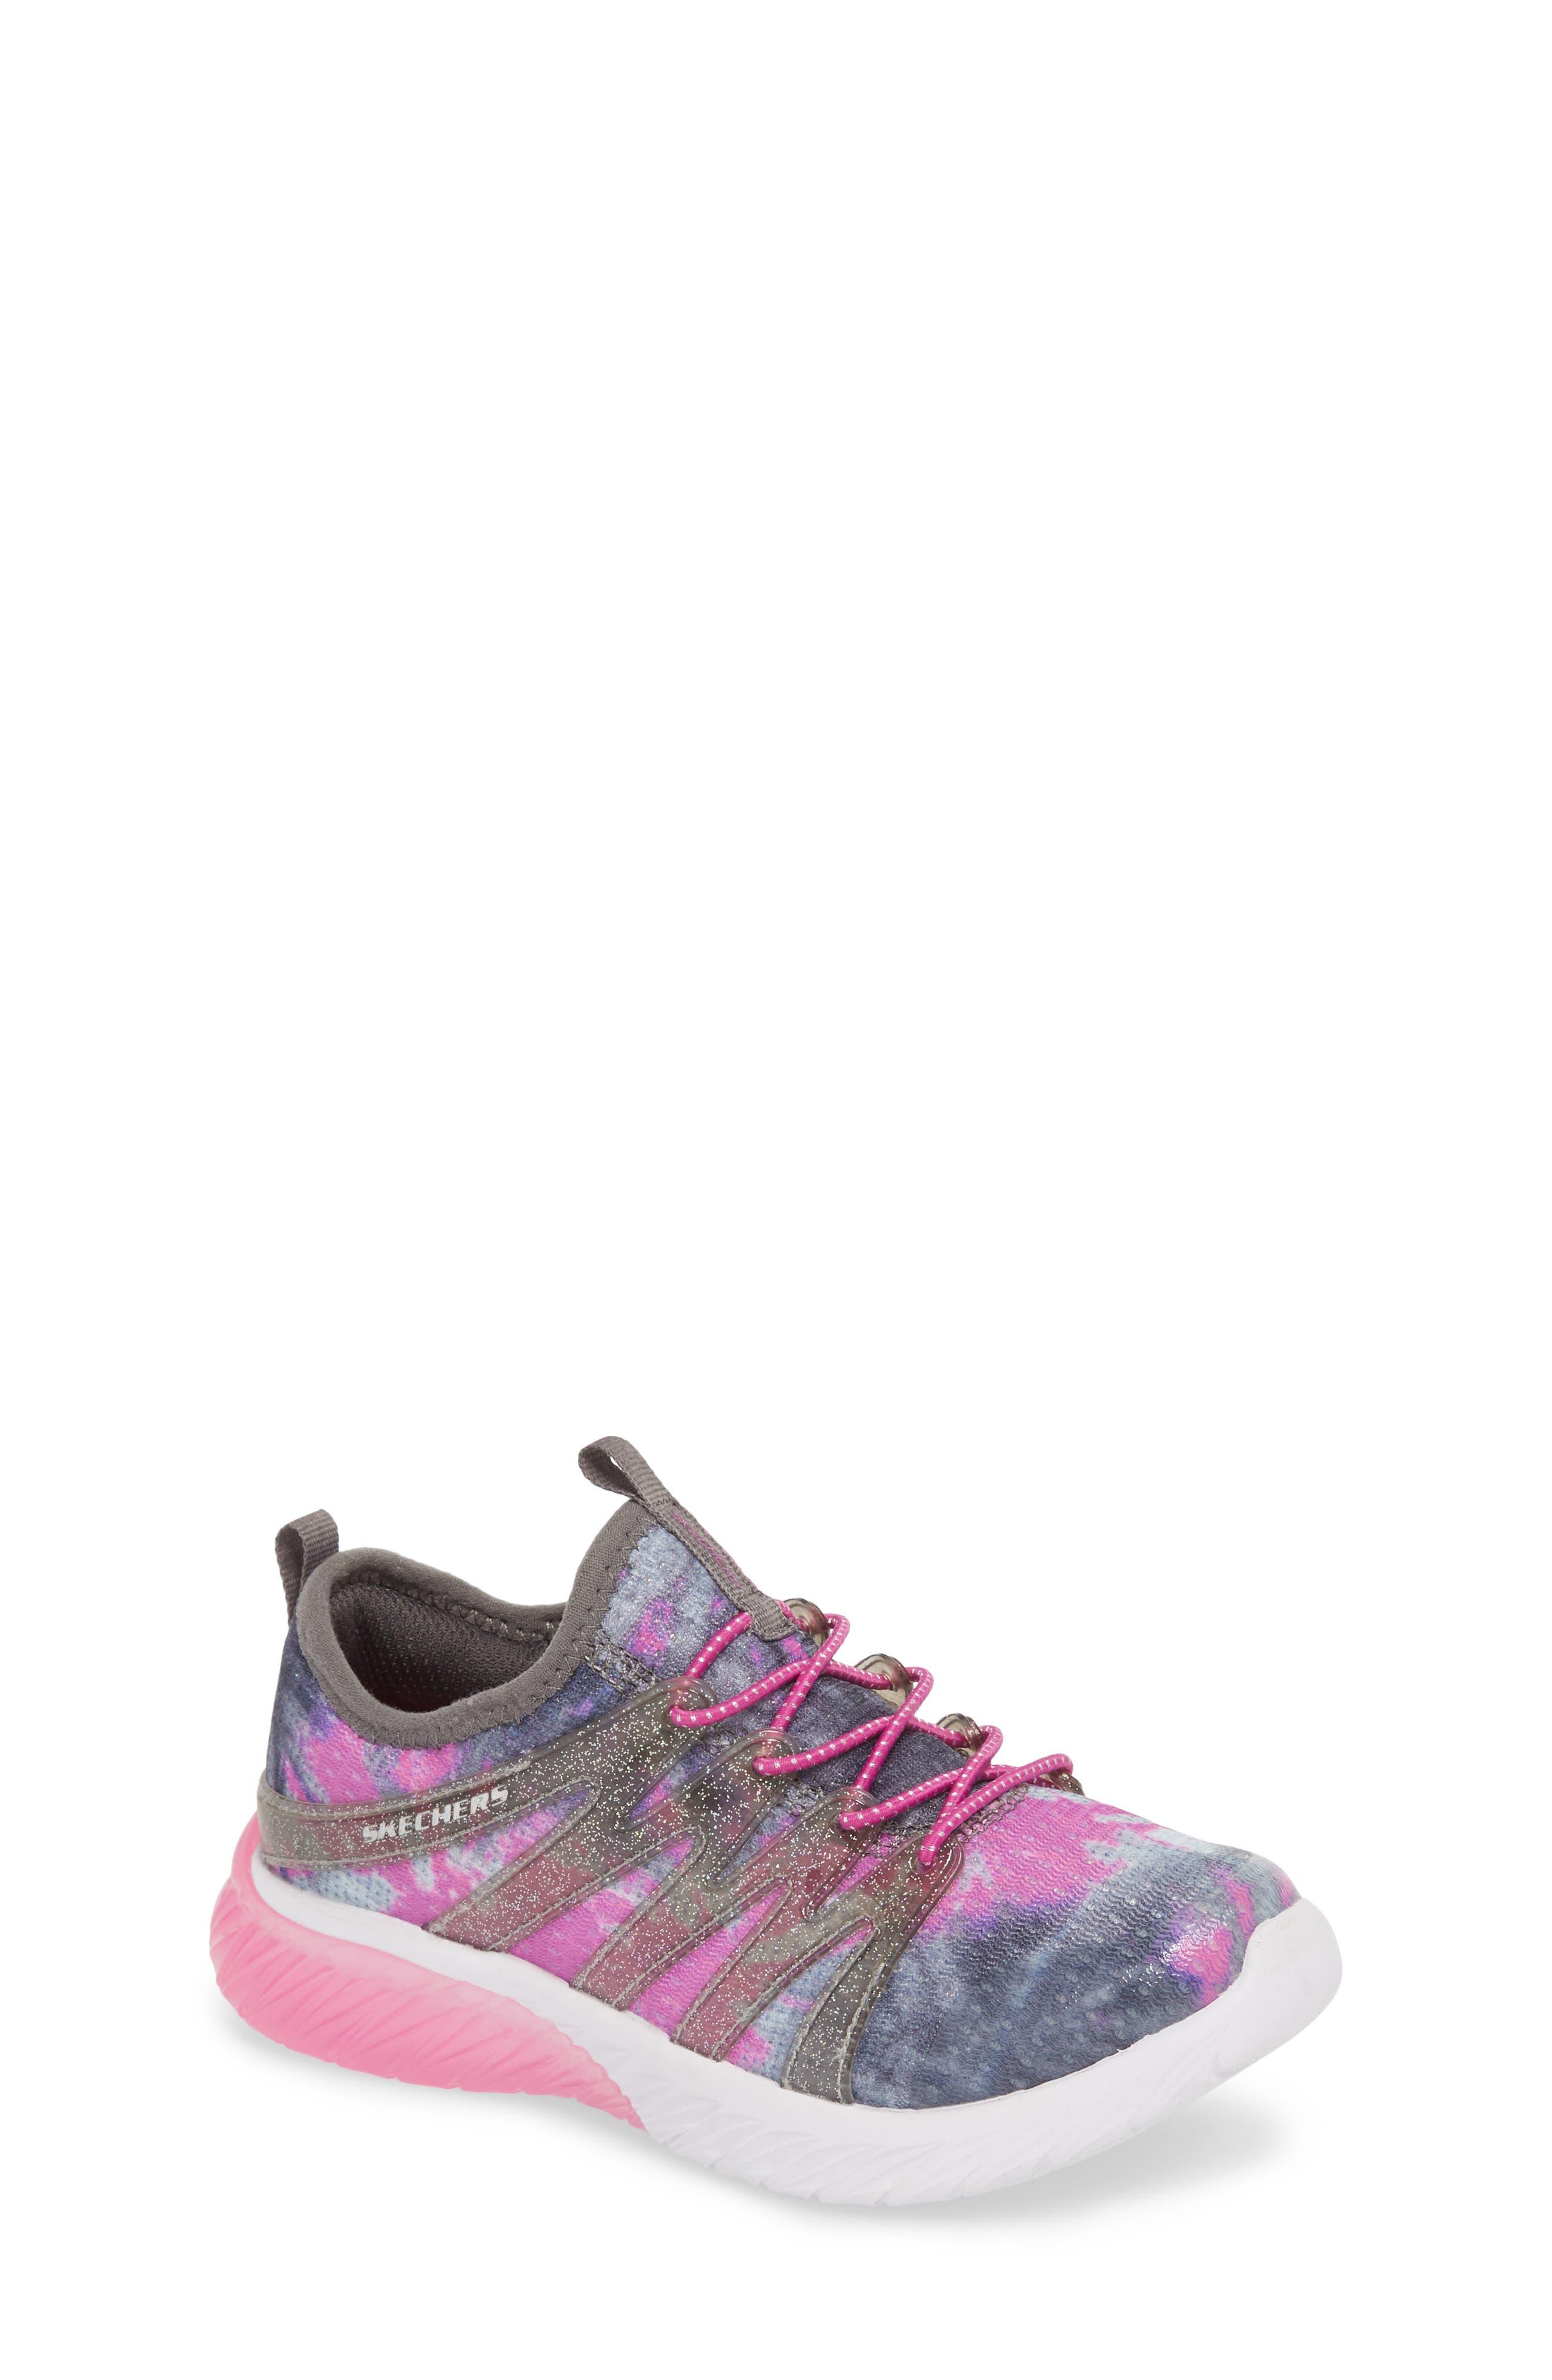 Skech Gem Glitter Sneaker,                         Main,                         color, Charcoal/ Hot Pink